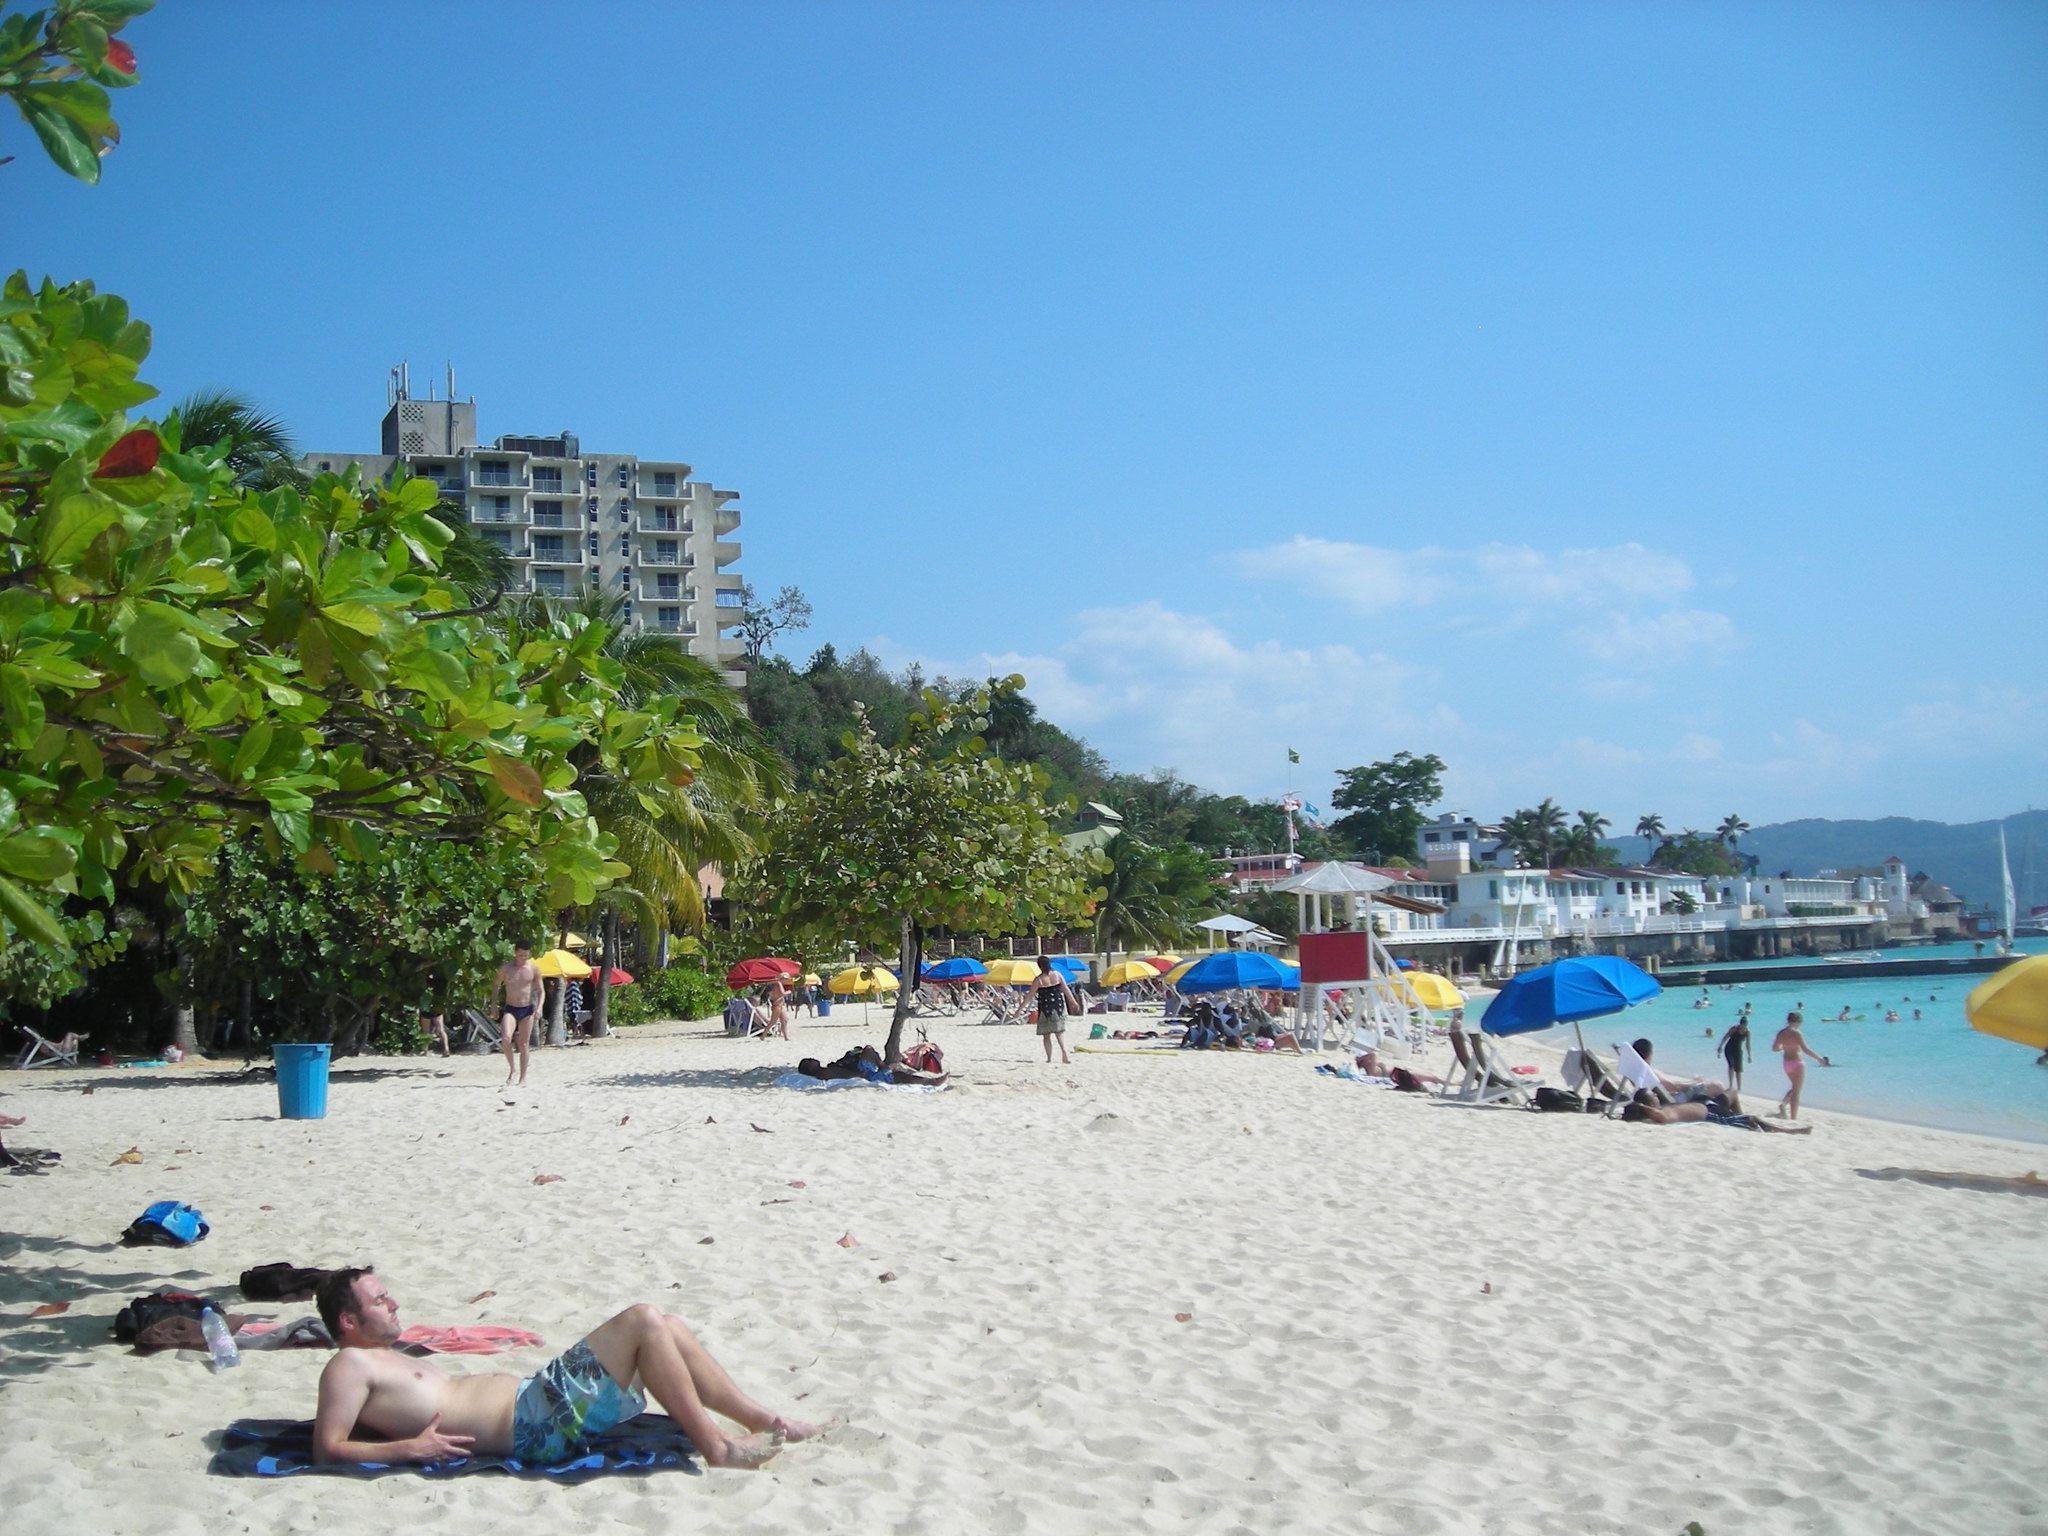 Best Beaches in Montego Bay, Jamaica - Top 10 Beaches in Montego Bay